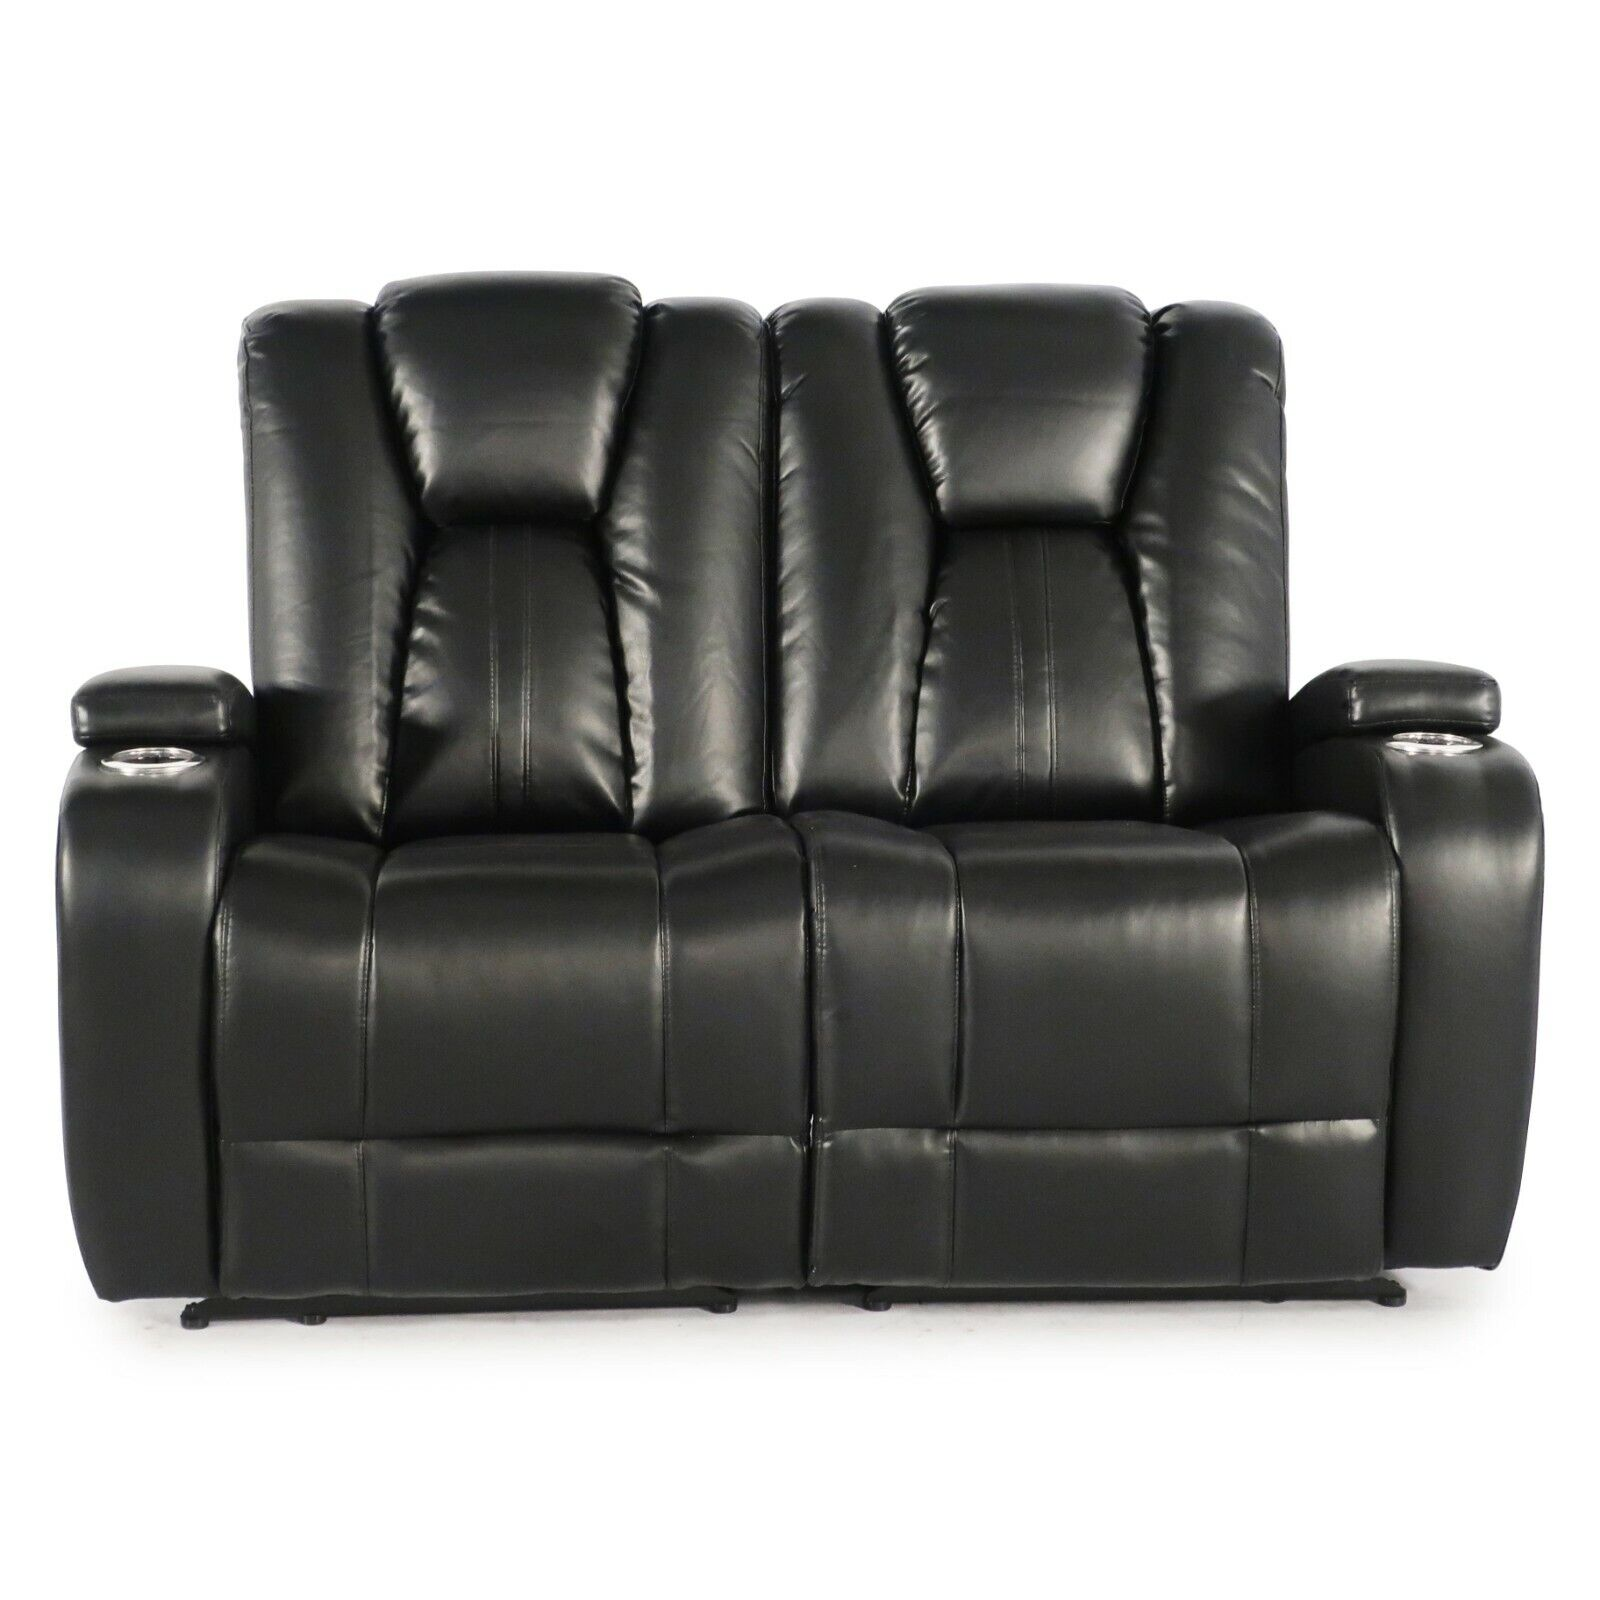 Seatcraft Innovator Black Home Theater Seating Loveseat Powe